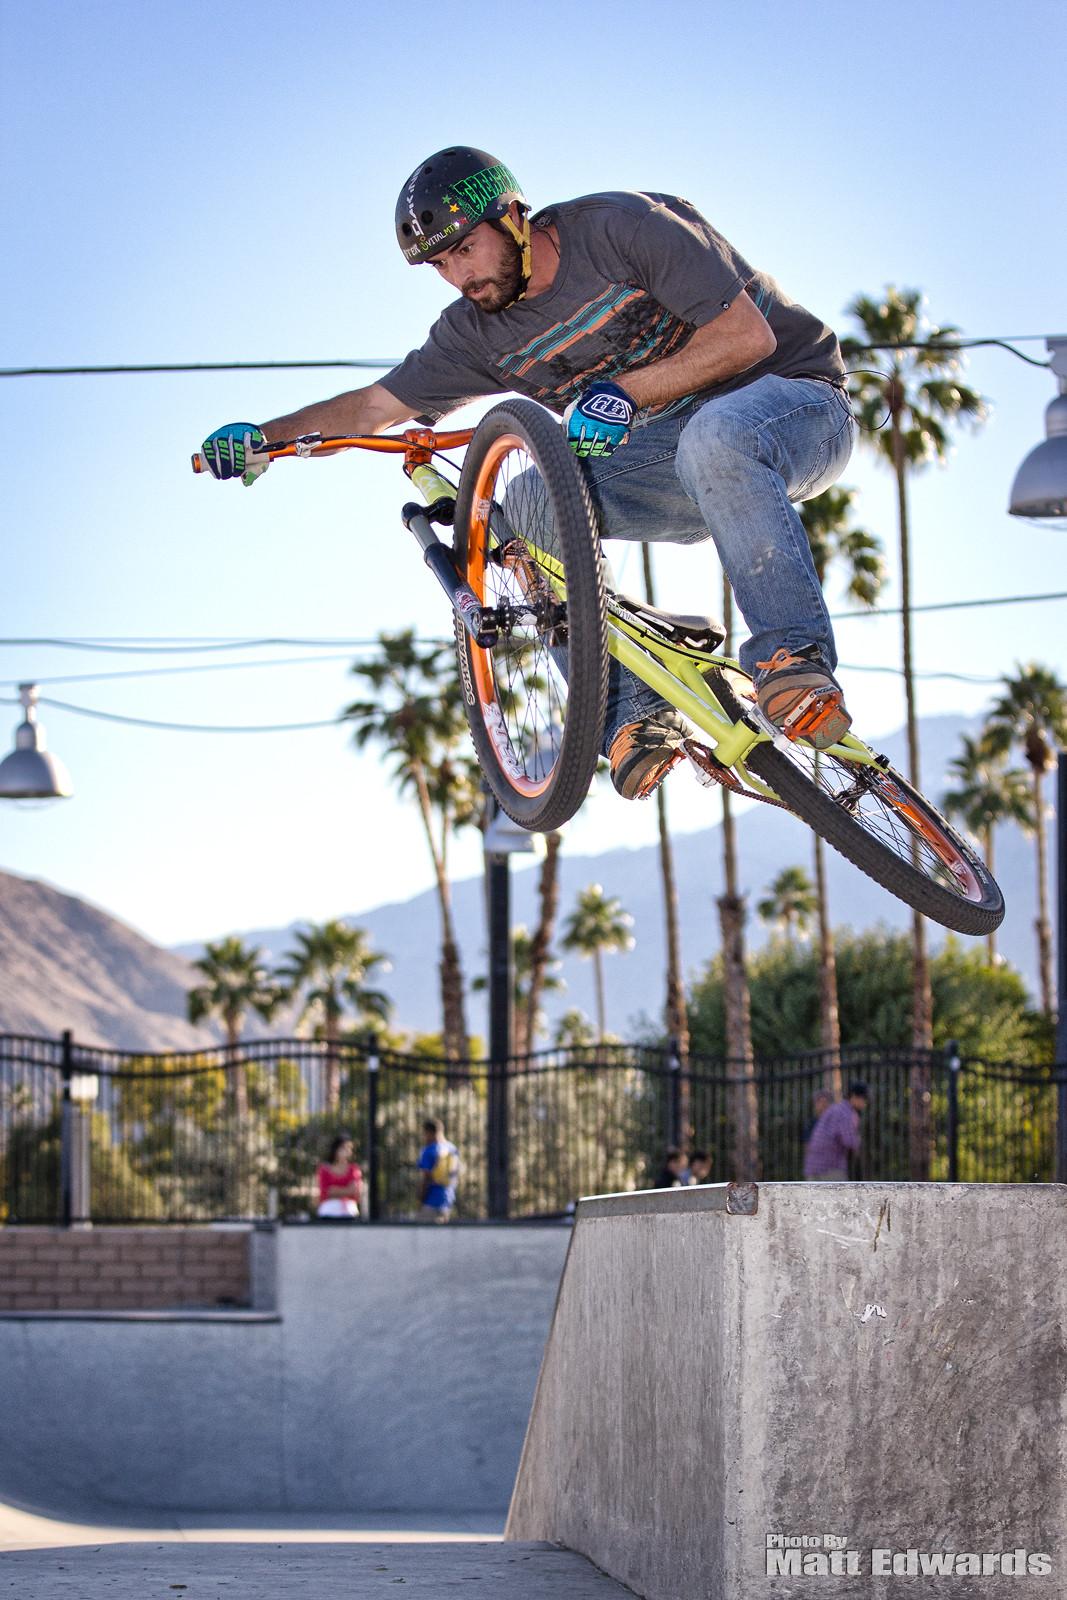 Boostin over the ledge - EdwardsEntertainment - Mountain Biking Pictures - Vital MTB